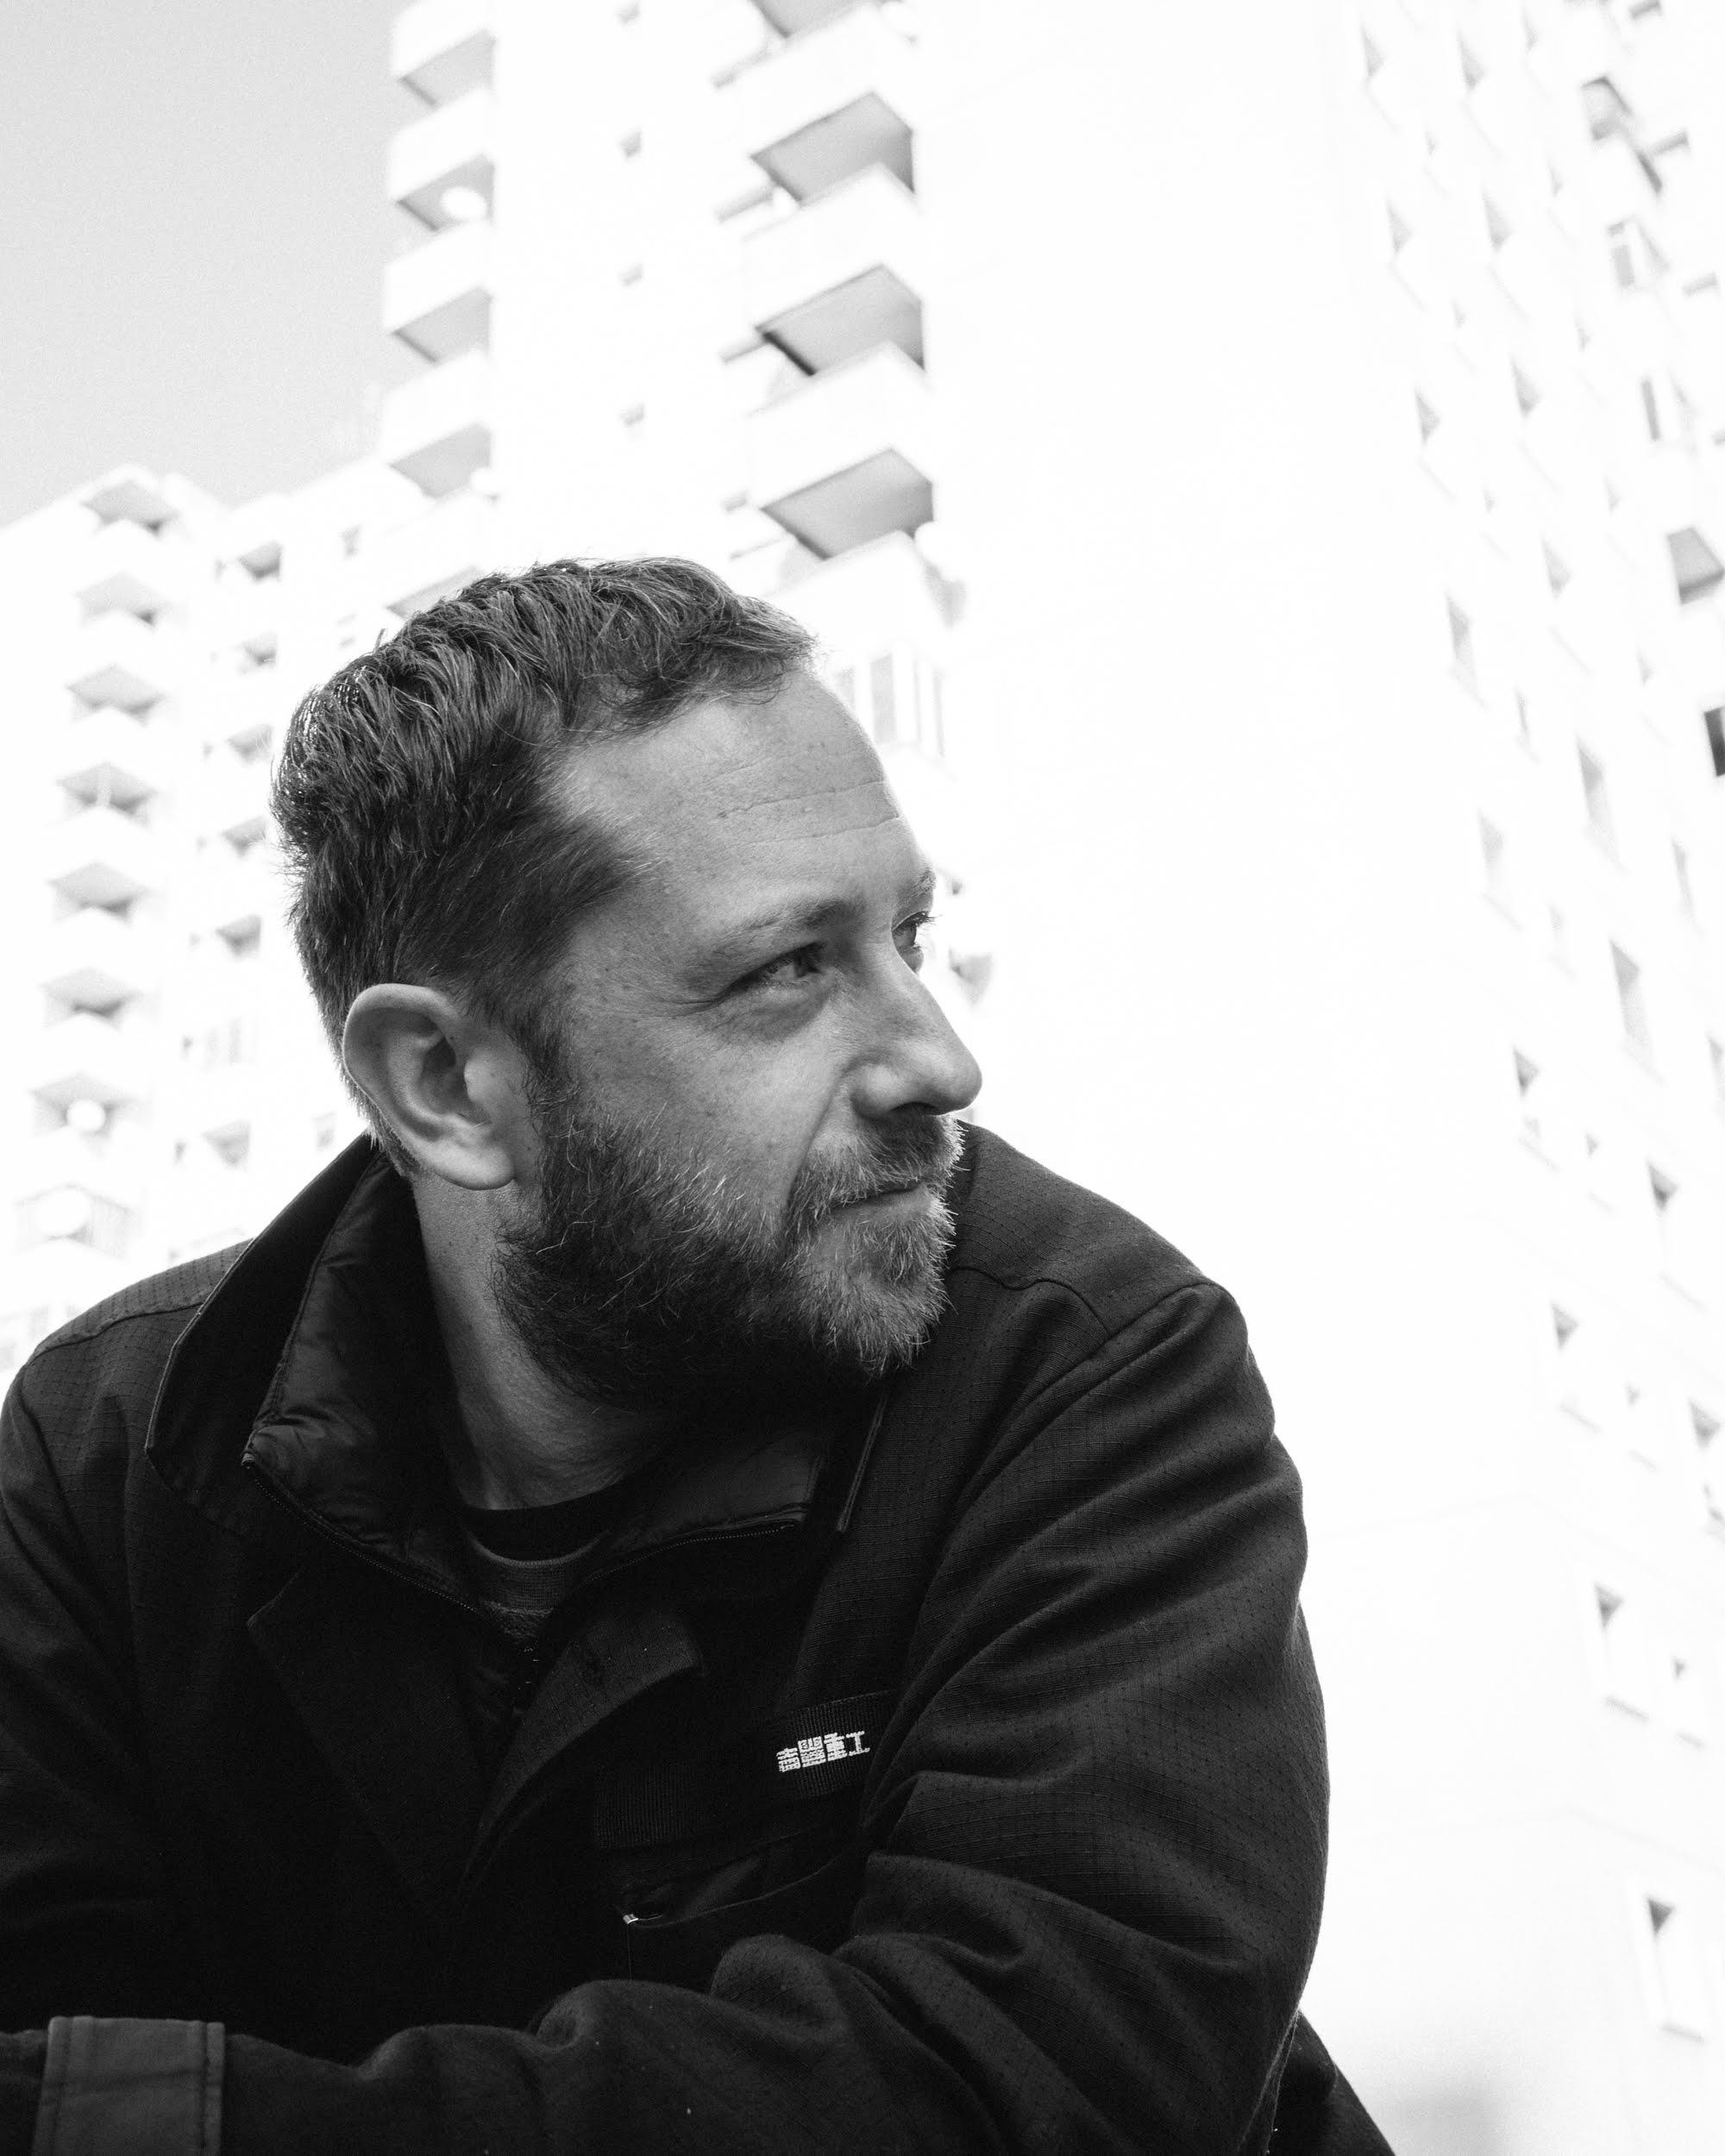 Sebastiano Leddi ph. Marco Onofri